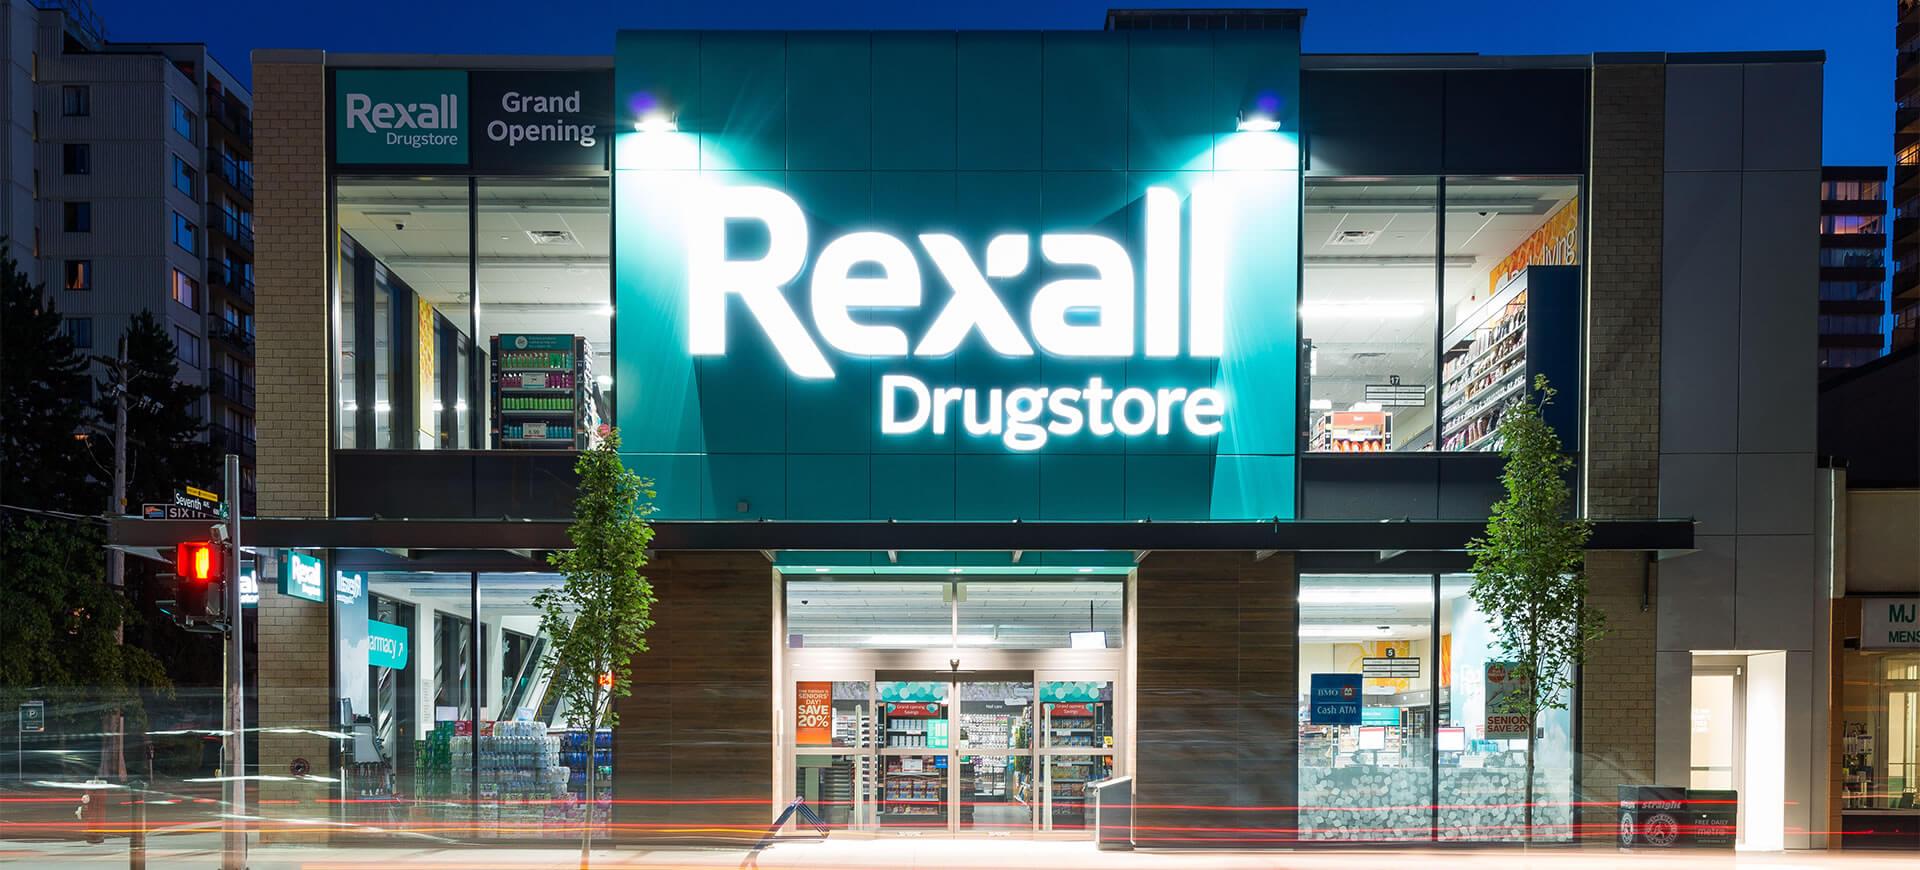 Rexall-Spire-July-2014-4-1920x870.jpg